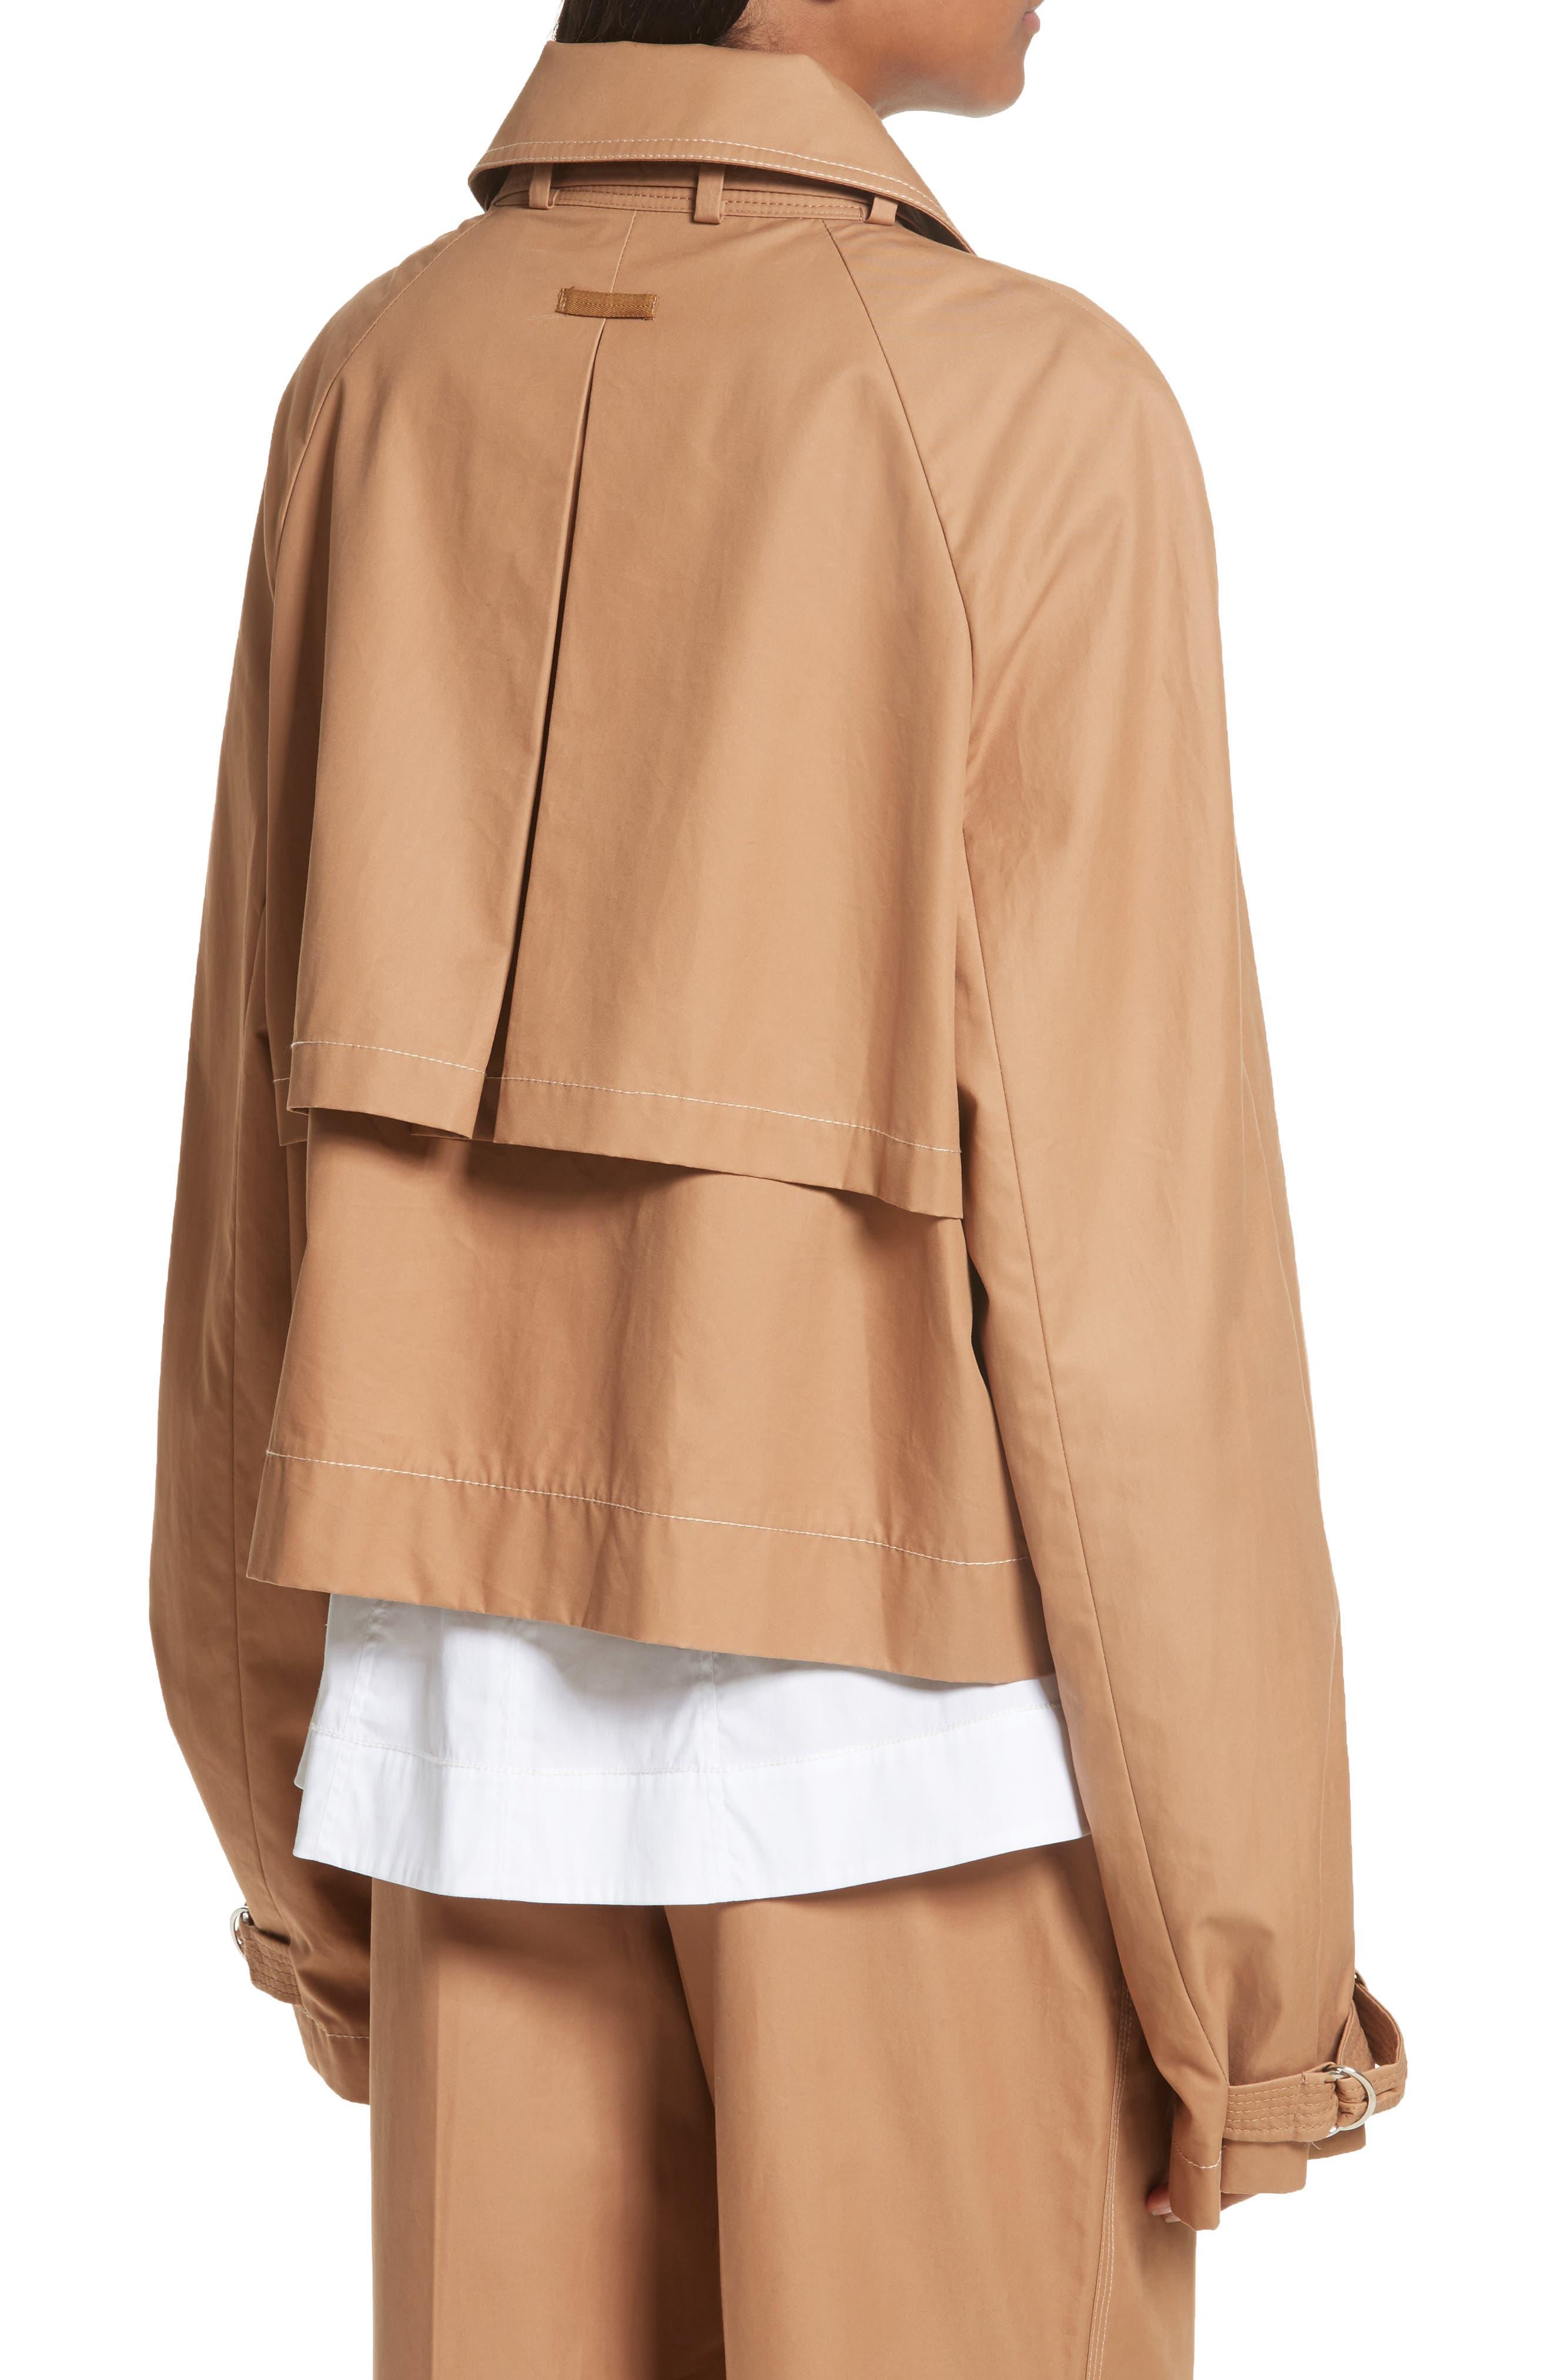 Eleta Short Trench Coat,                             Alternate thumbnail 2, color,                             206